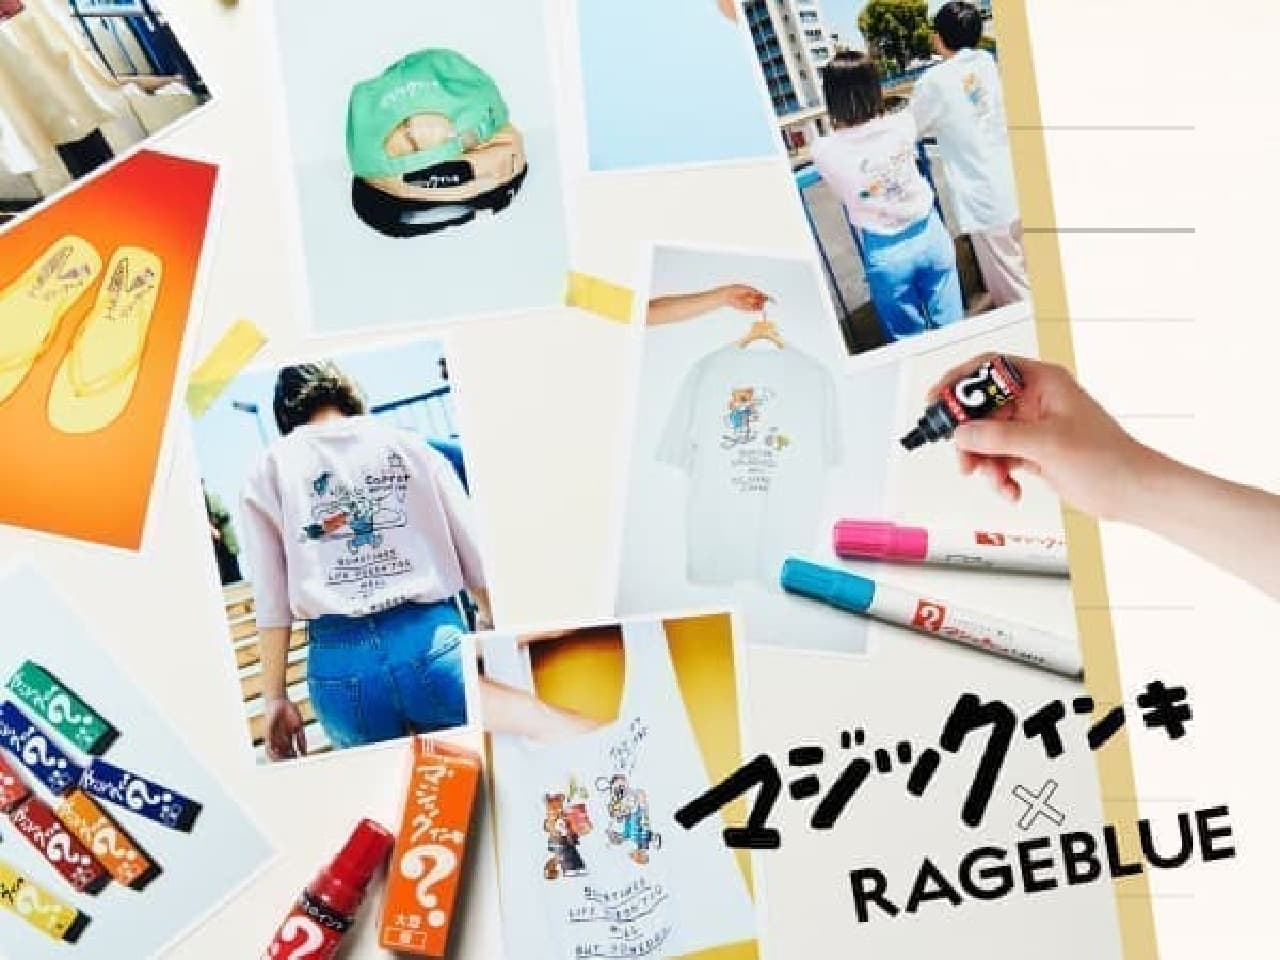 RAGEBLUE×マジックインキがコラボ!カラフルなTシャツ・エコバッグなど